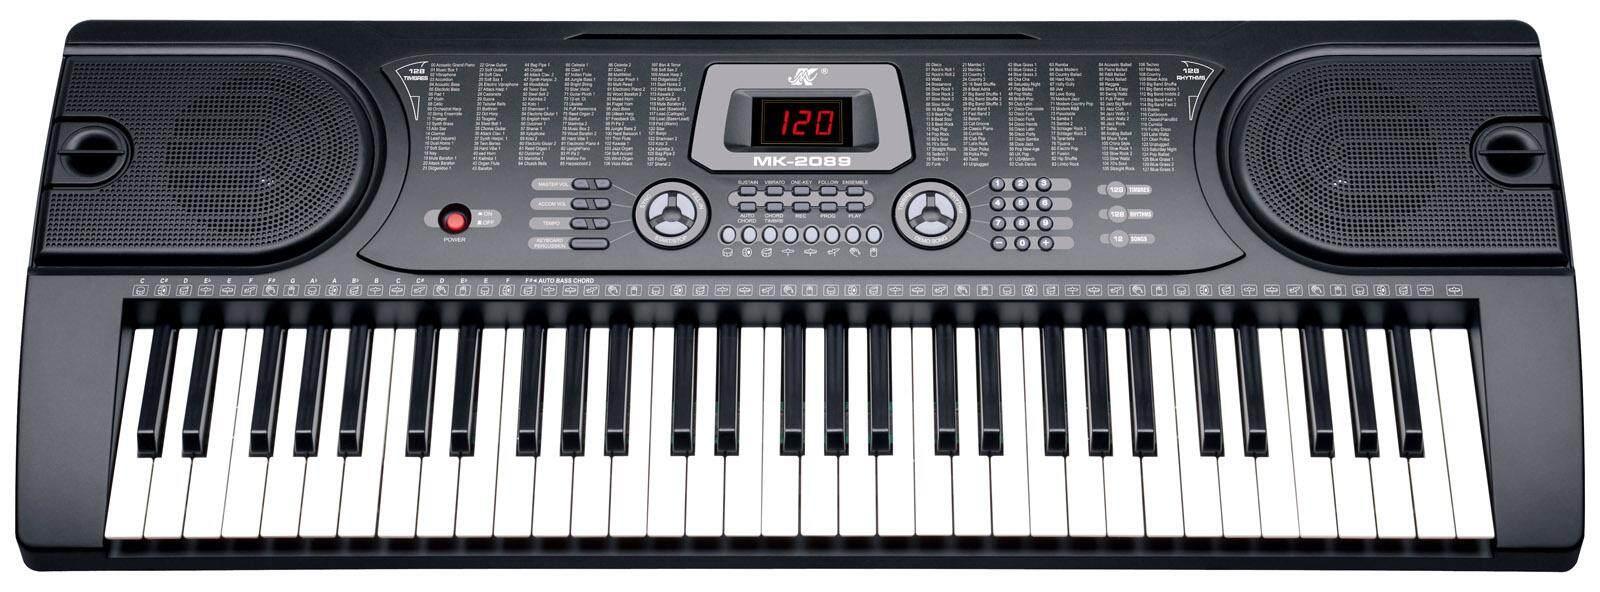 Fujicom 61 Keys Professional Electronic Piano Organ Portable Keyboard with  AC adaptor